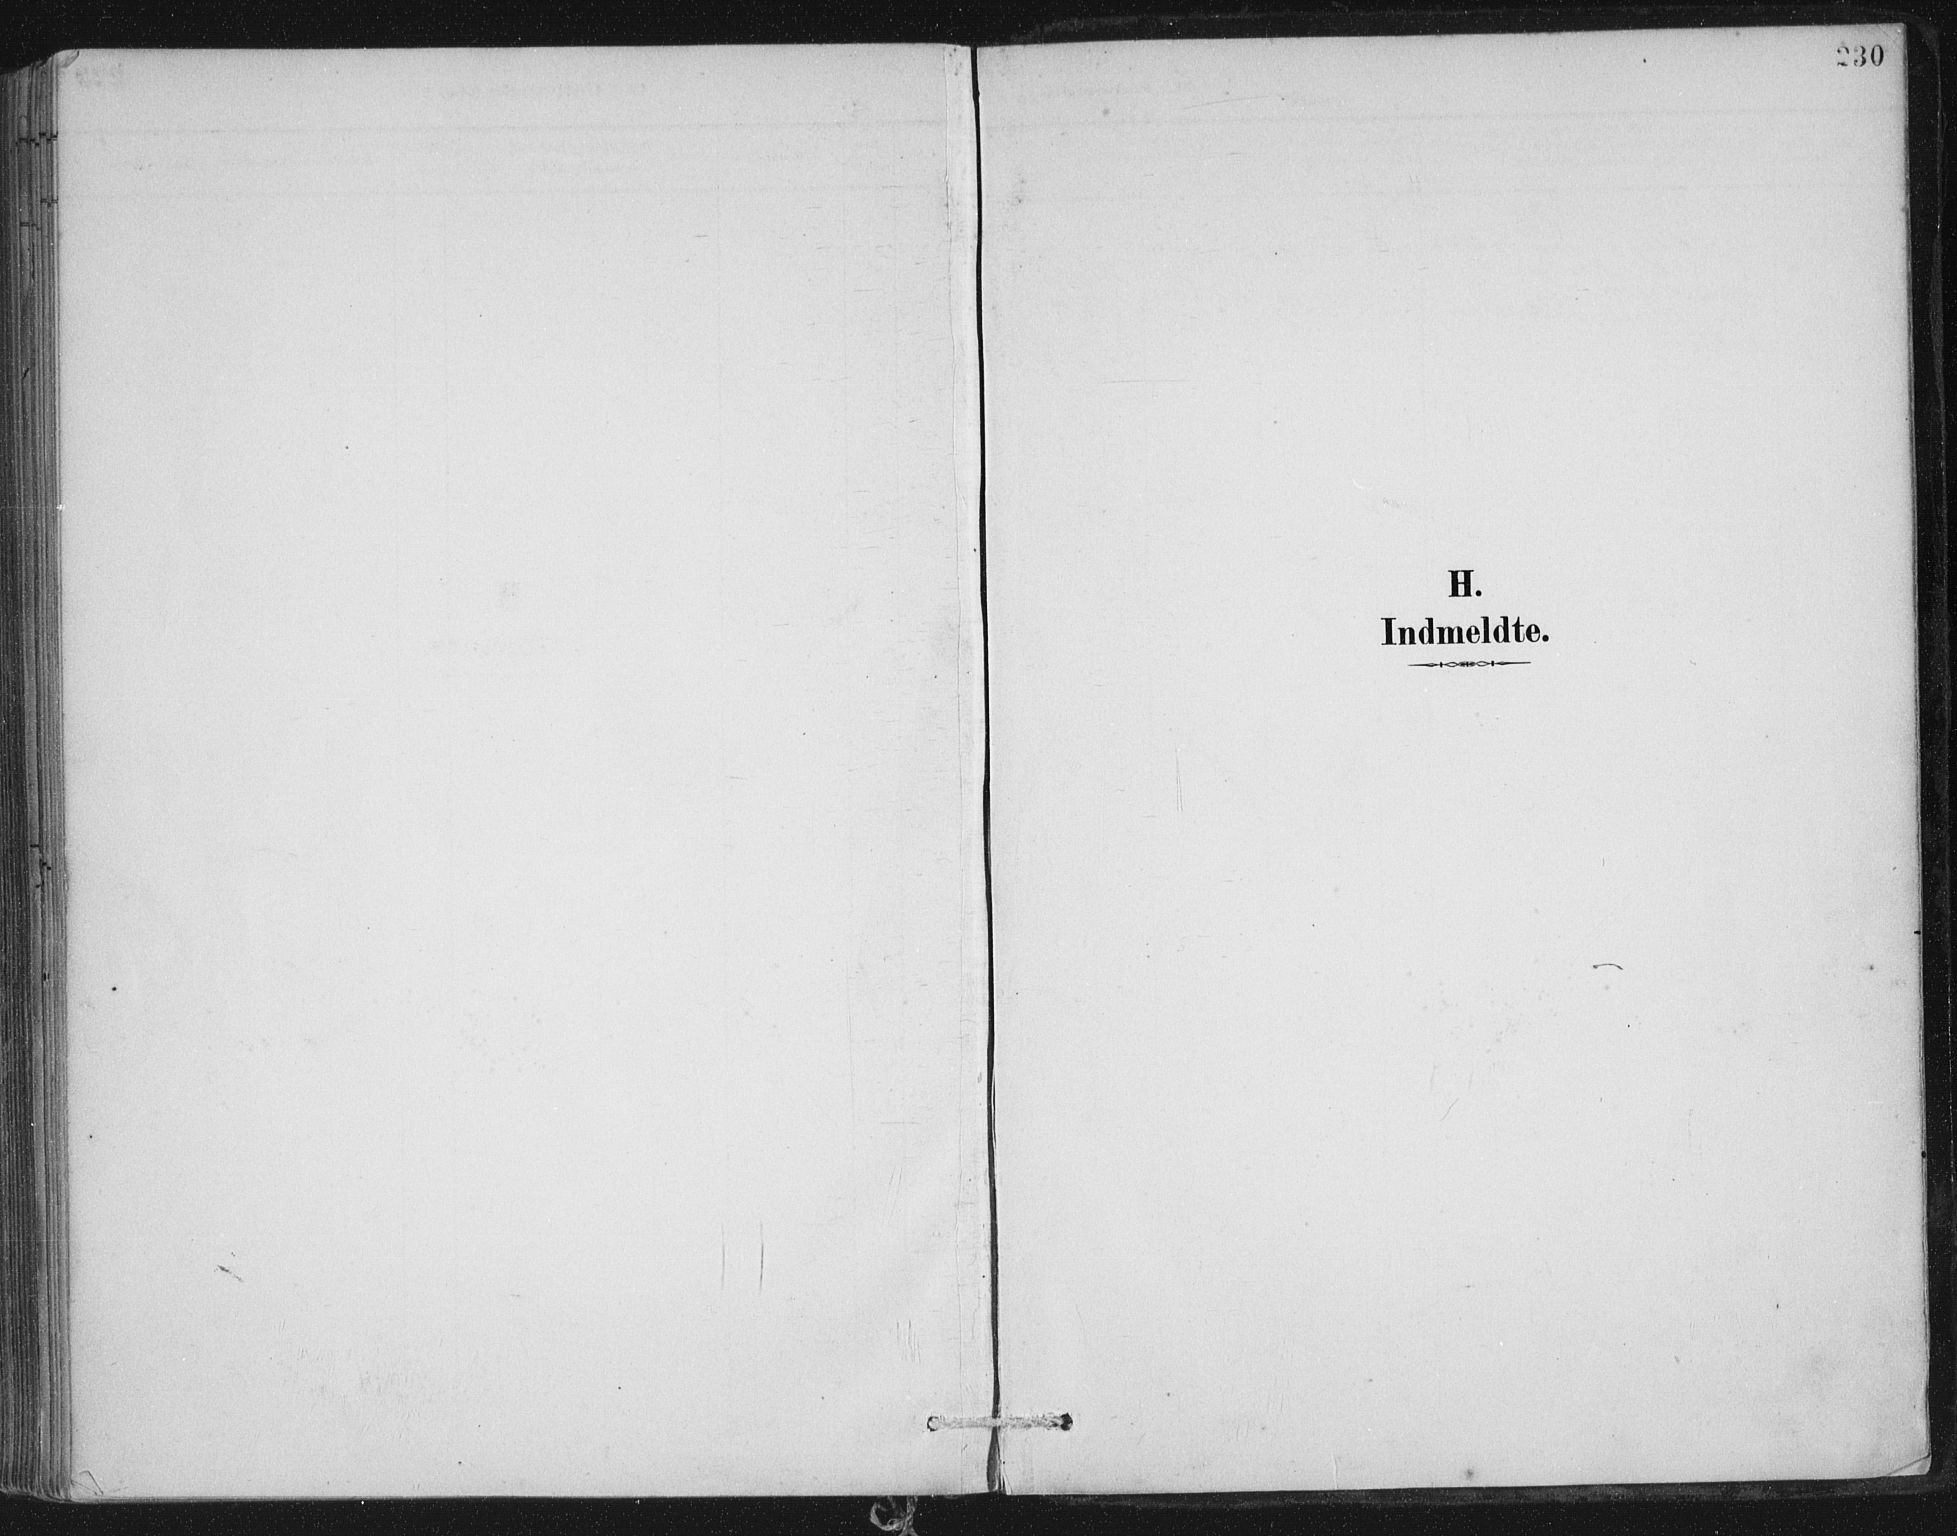 SAST, Nedstrand sokneprestkontor, IV: Ministerialbok nr. A 12, 1887-1915, s. 230